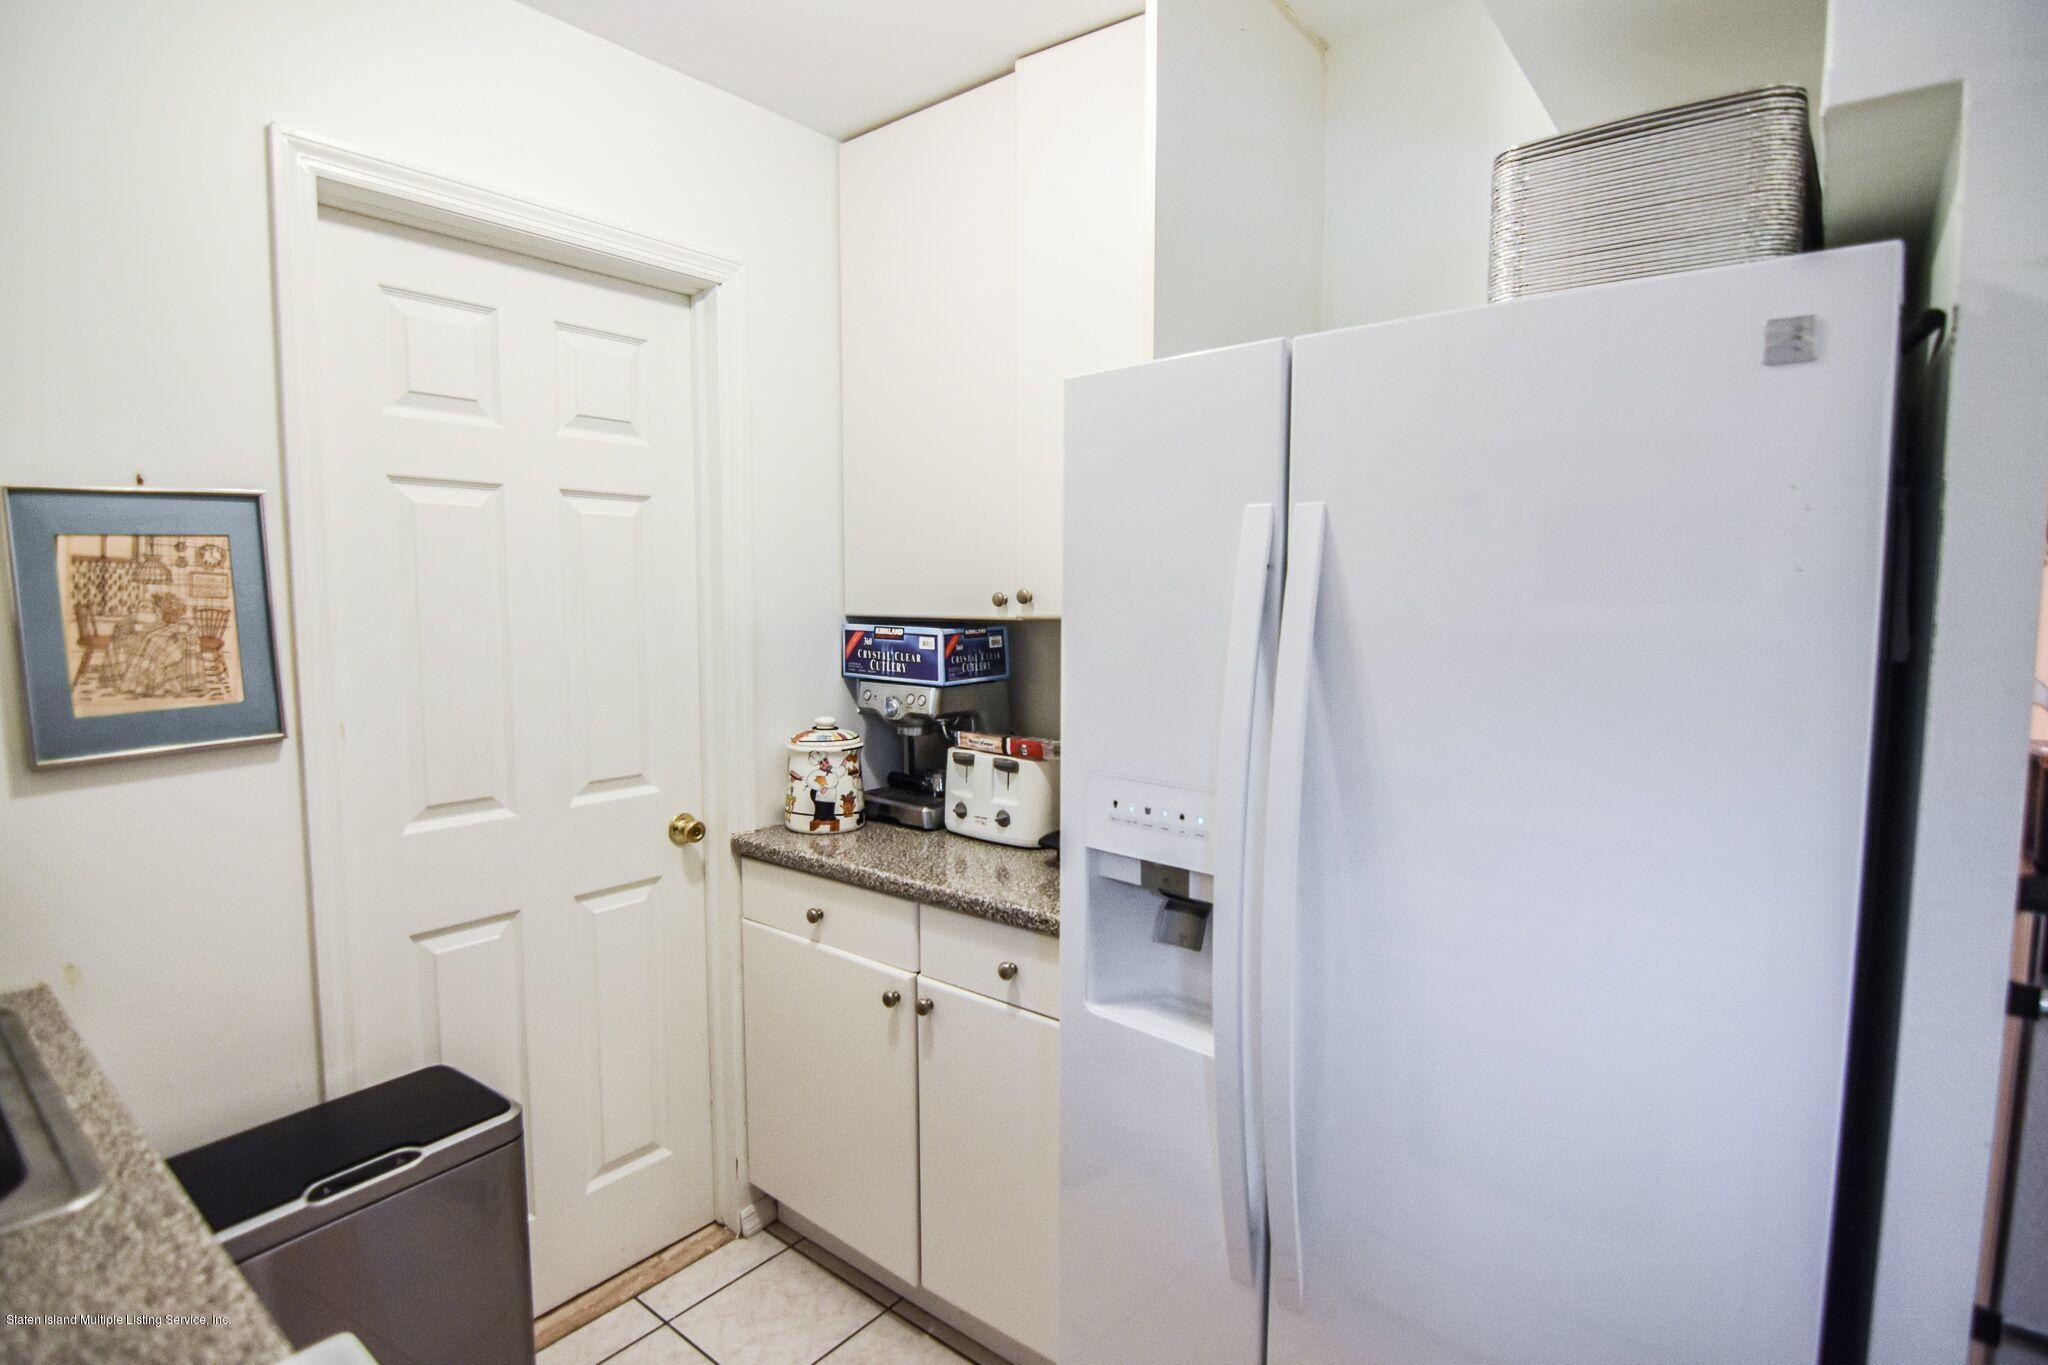 Two Family - Detached 3 Fieldstone Road  Staten Island, NY 10314, MLS-1131141-26